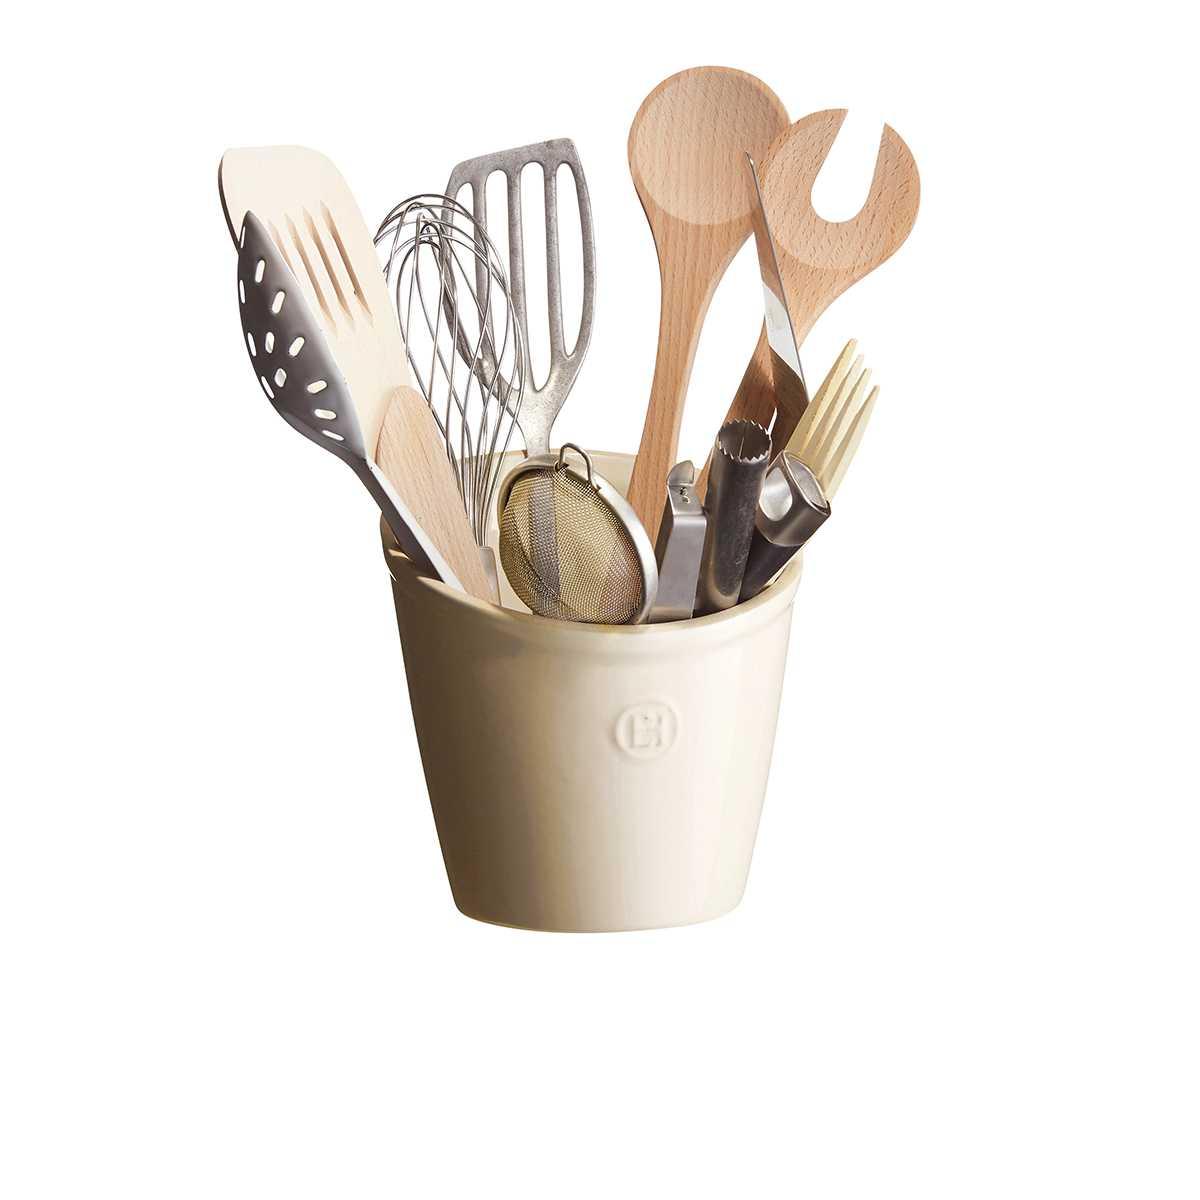 Подставка для кухонных принадлежностей Emile Henry Kitchen Tools  (020218) Emile Henry 020218 фото 1